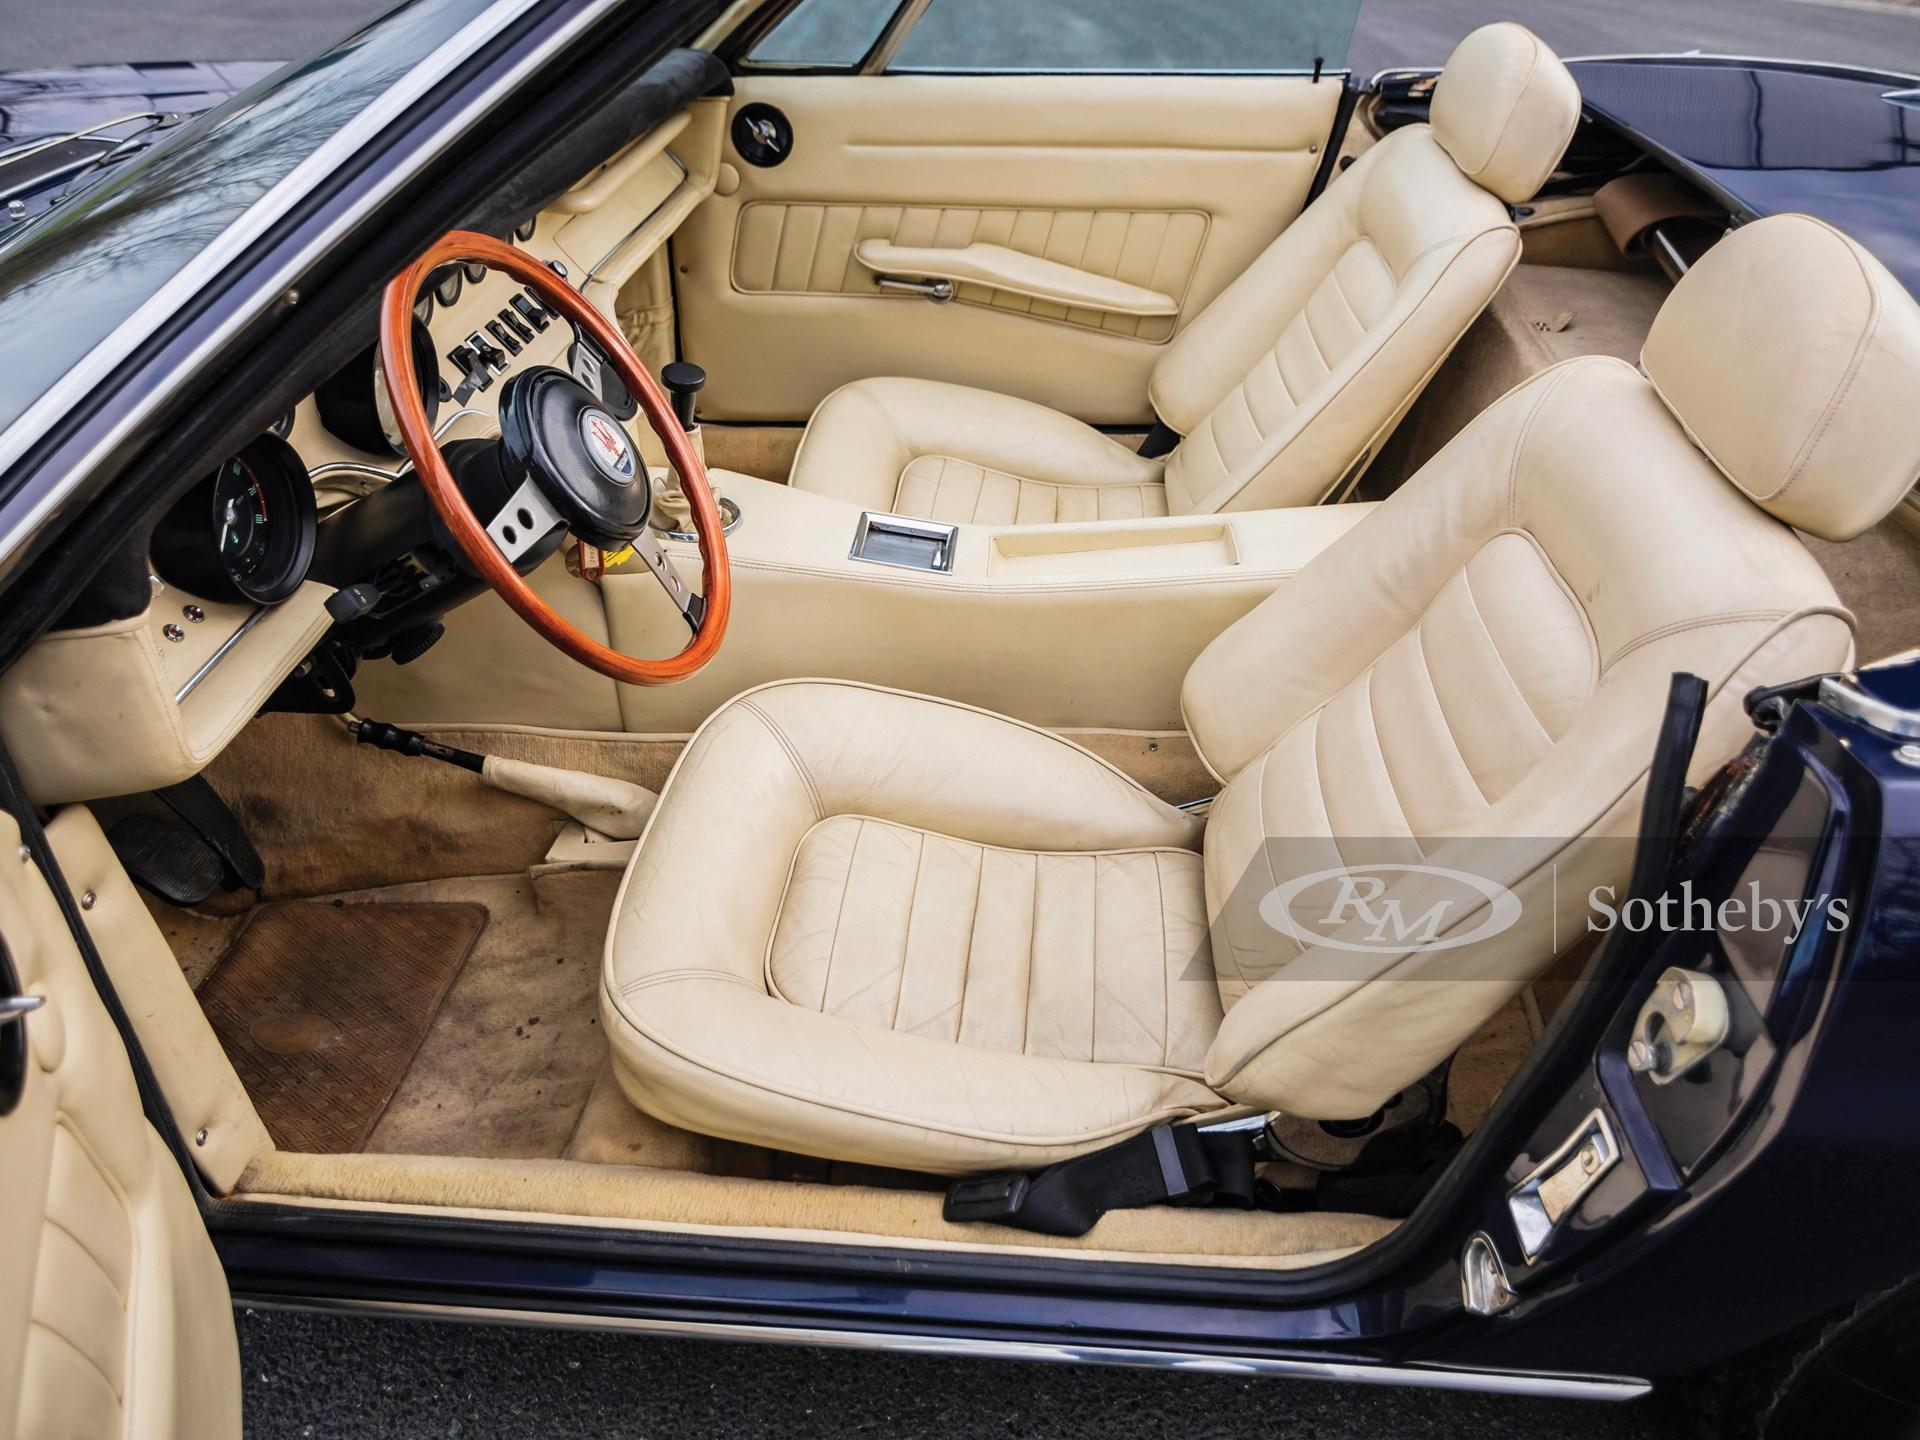 1970 Maserati Ghibli 4.7 Spyder Conversion  -